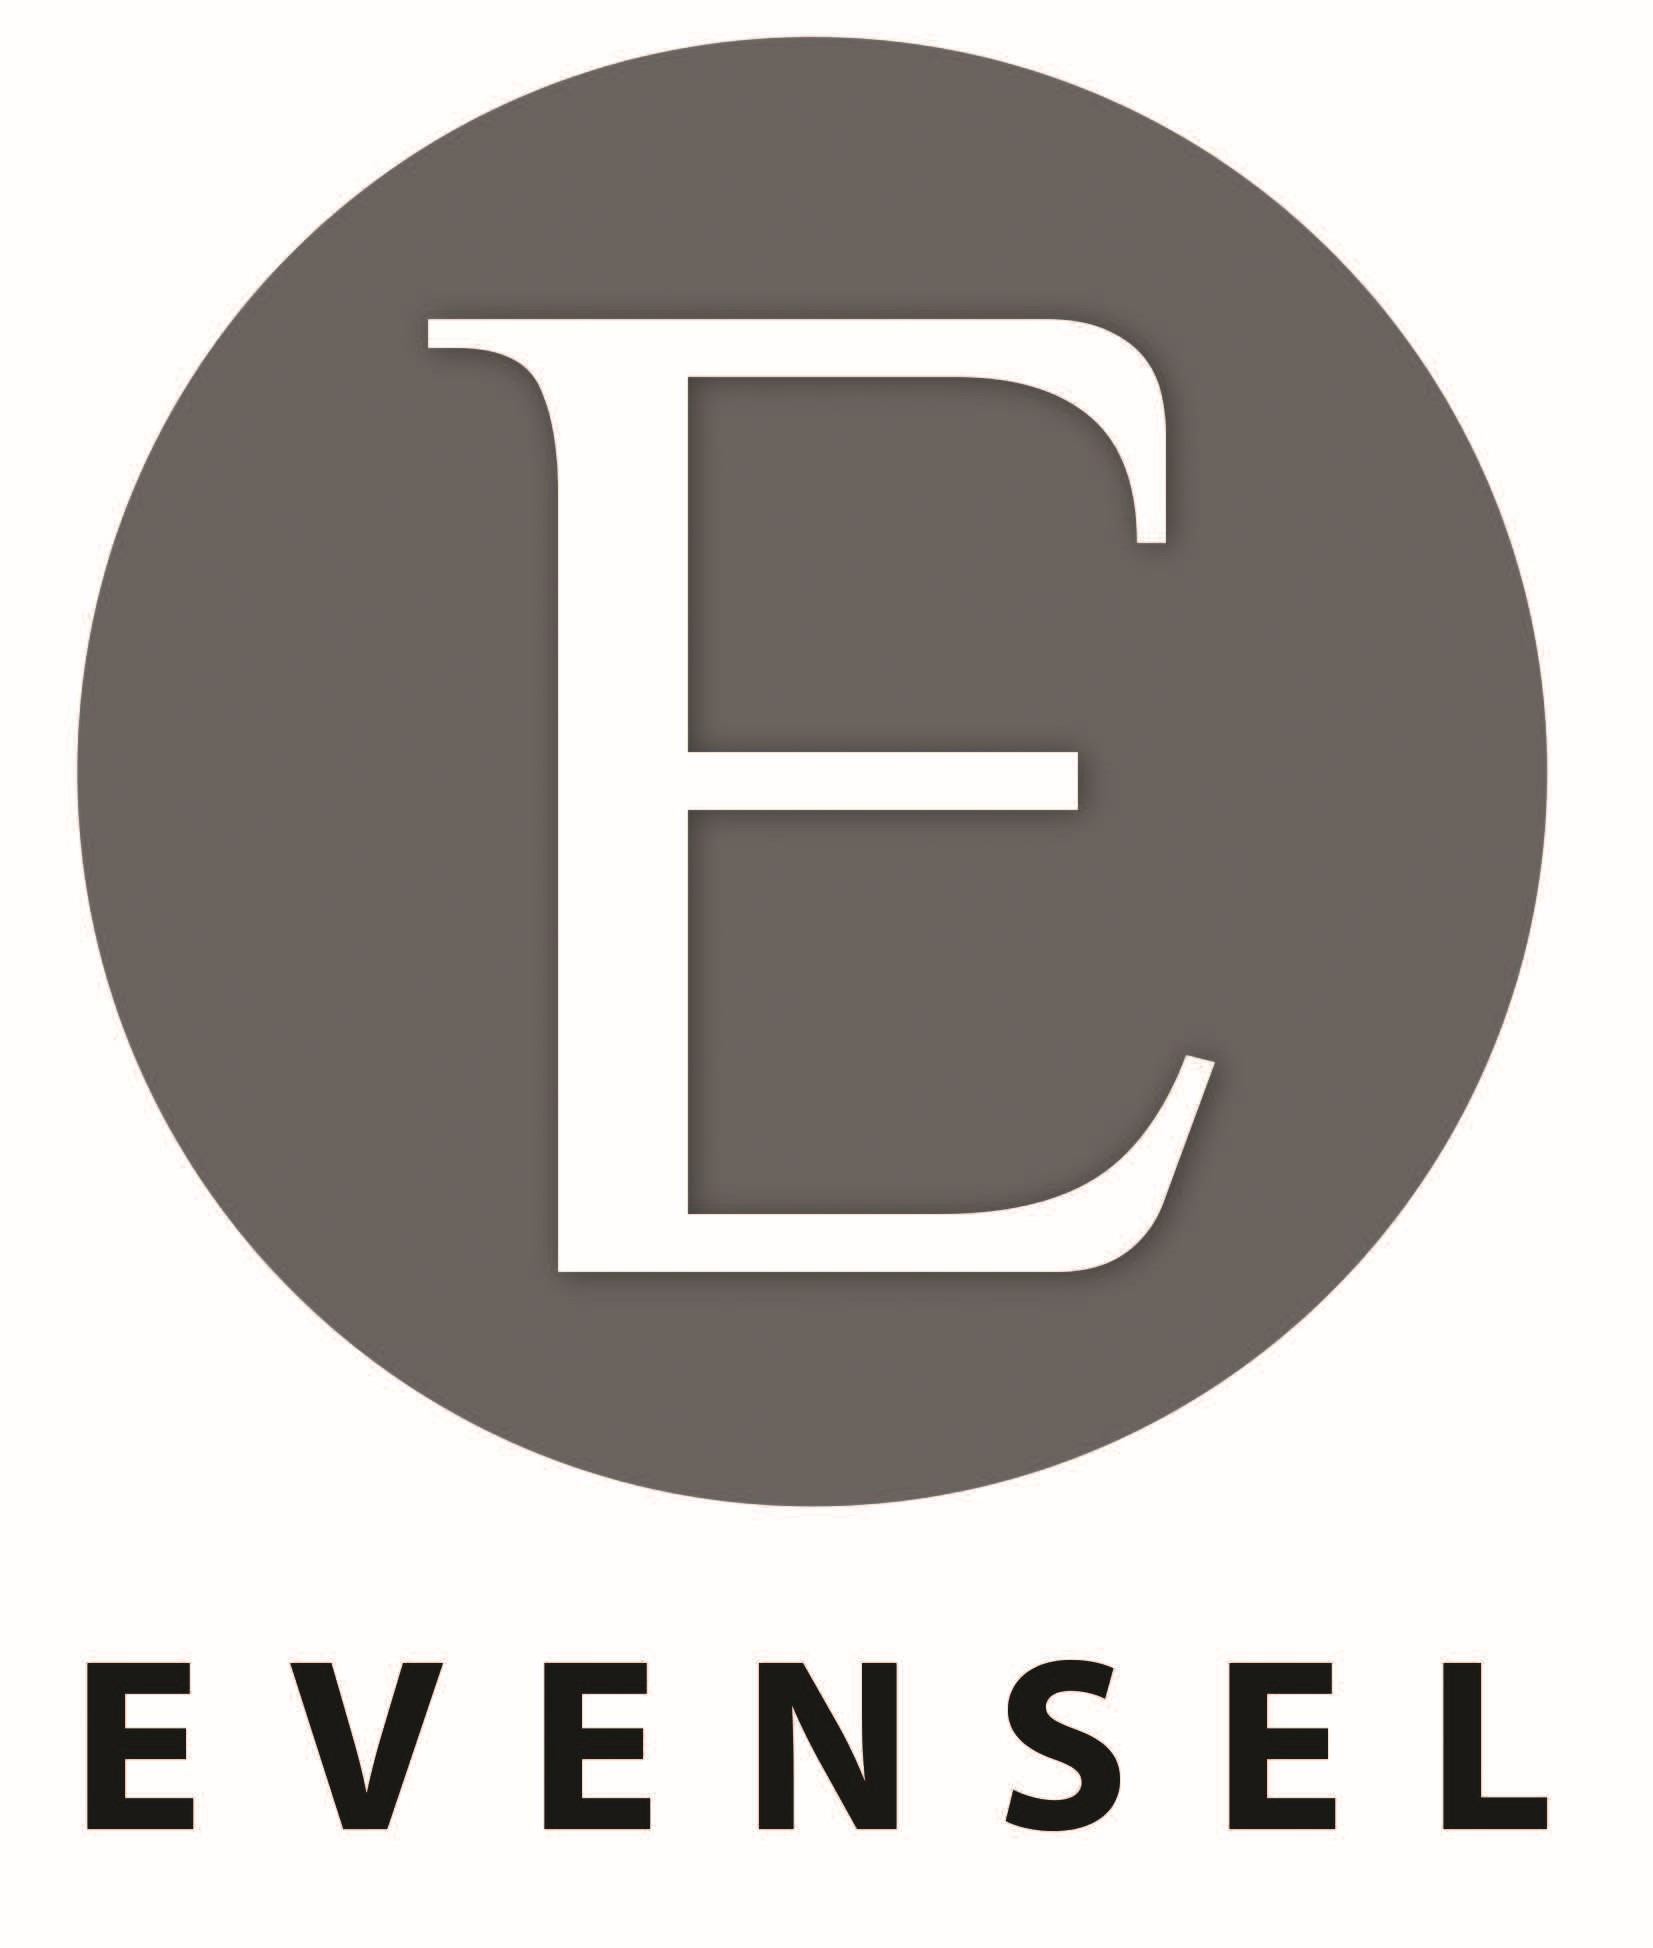 Evensel-IT